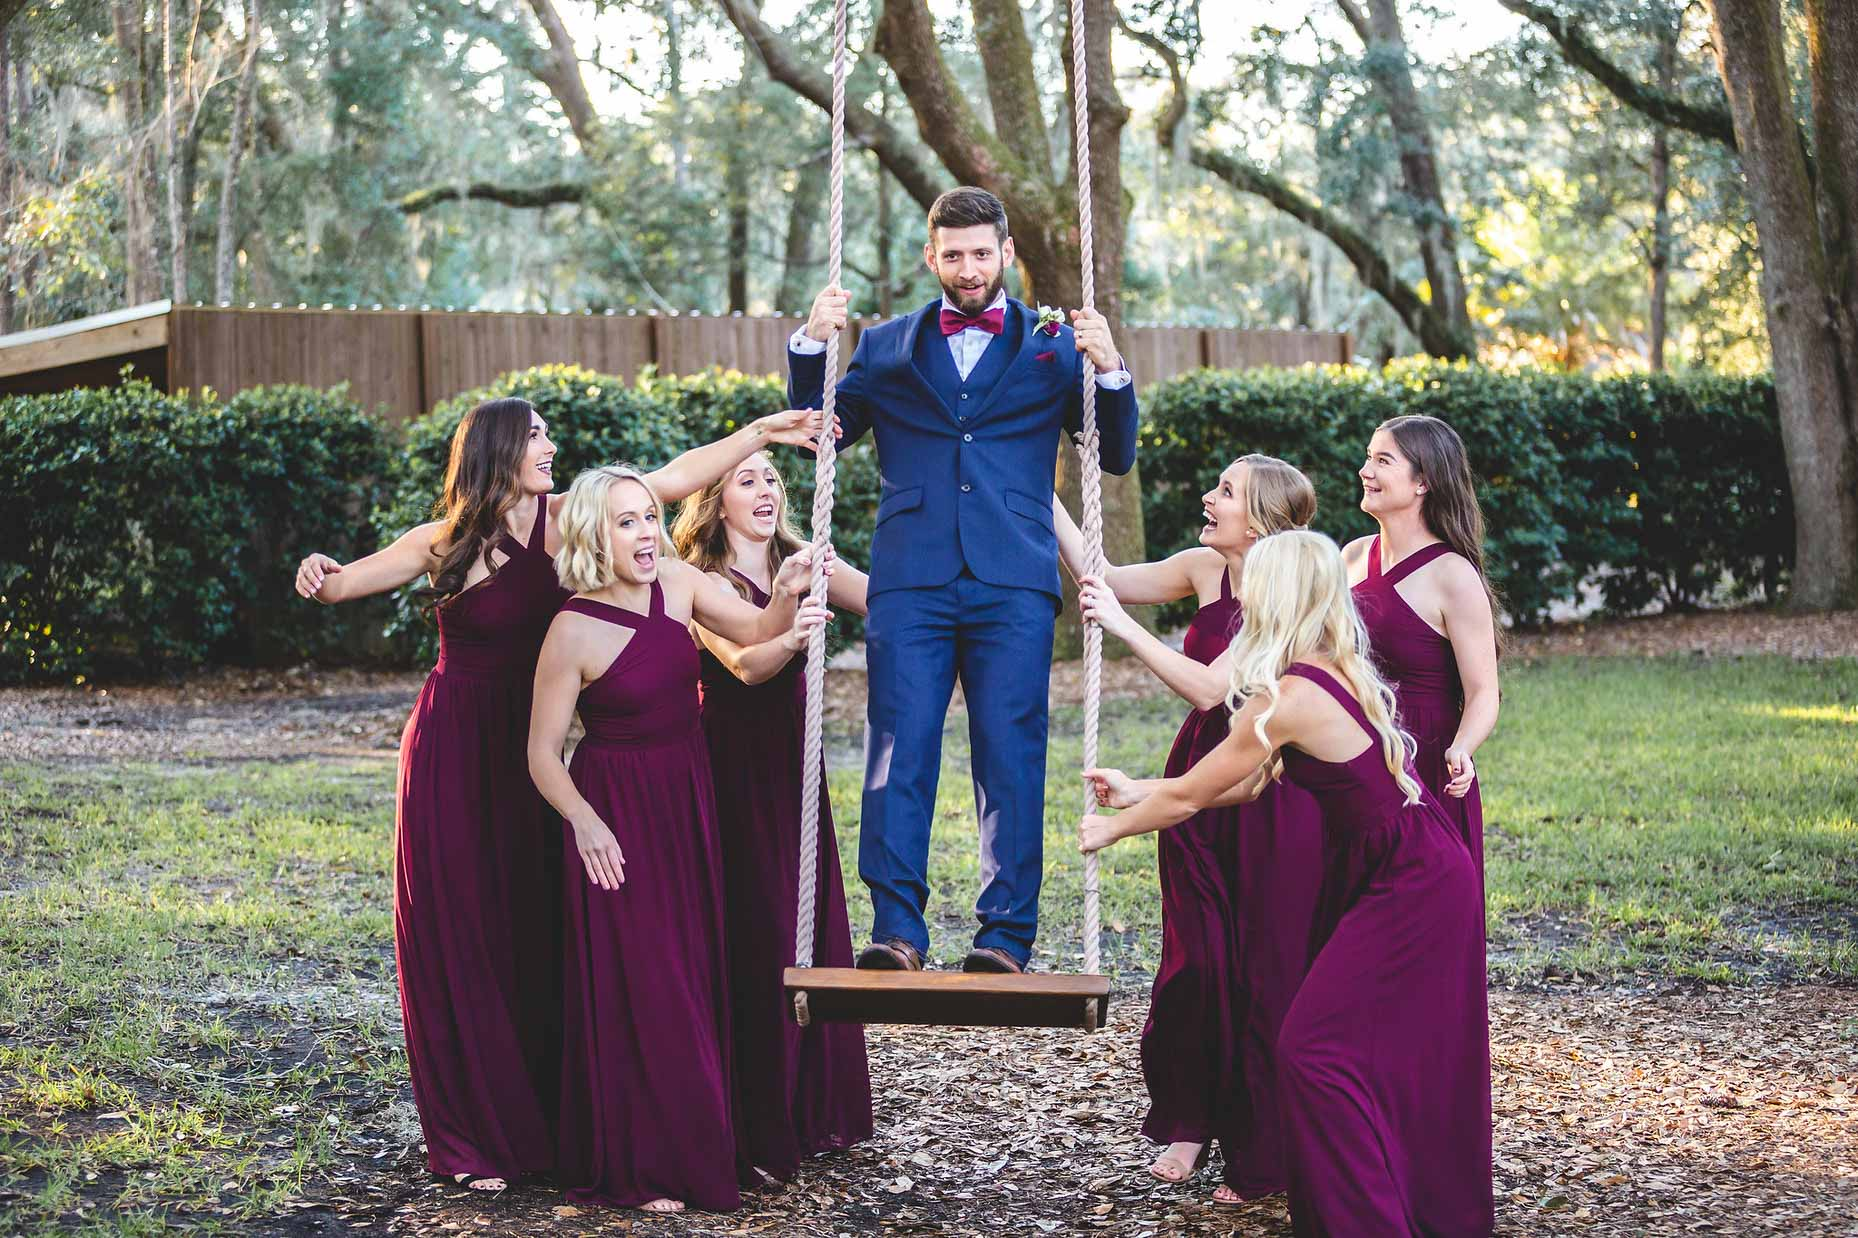 adam-szarmack-bowing-oaks-wedding-photographer-jacksonville-96.jpg